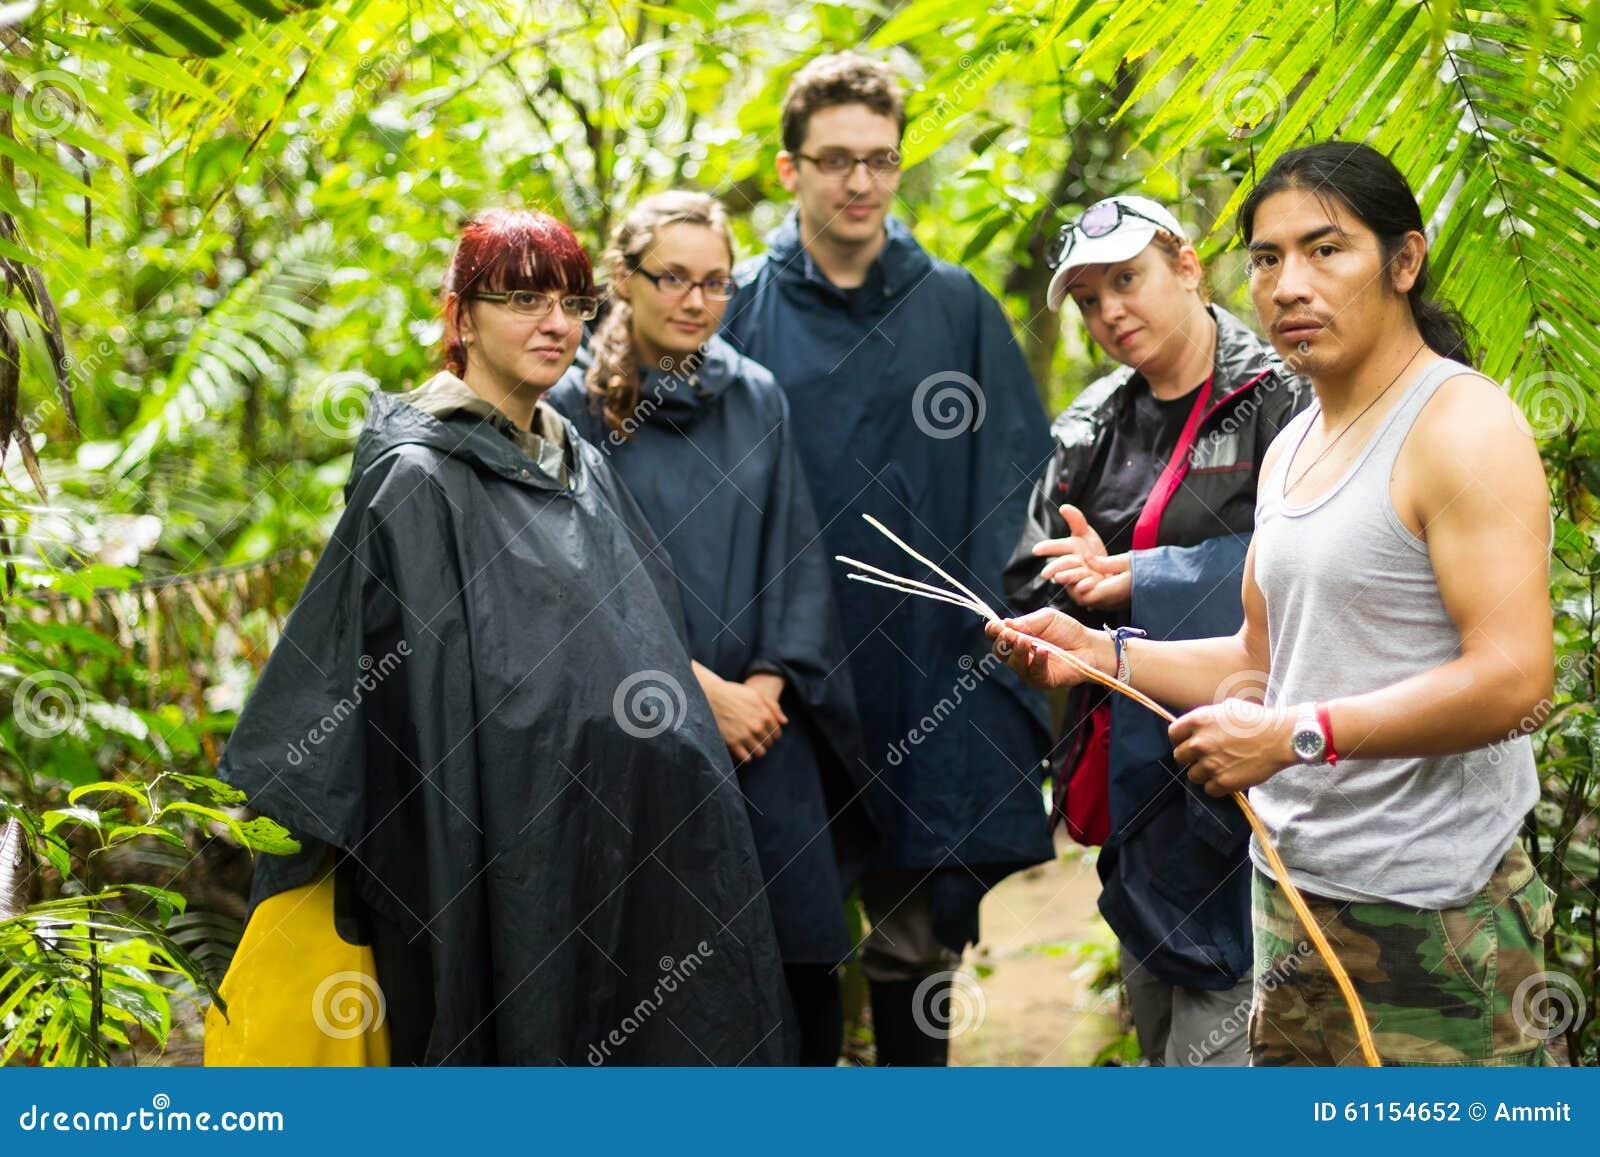 Touristen gruppieren in Amazonas-Gebiet